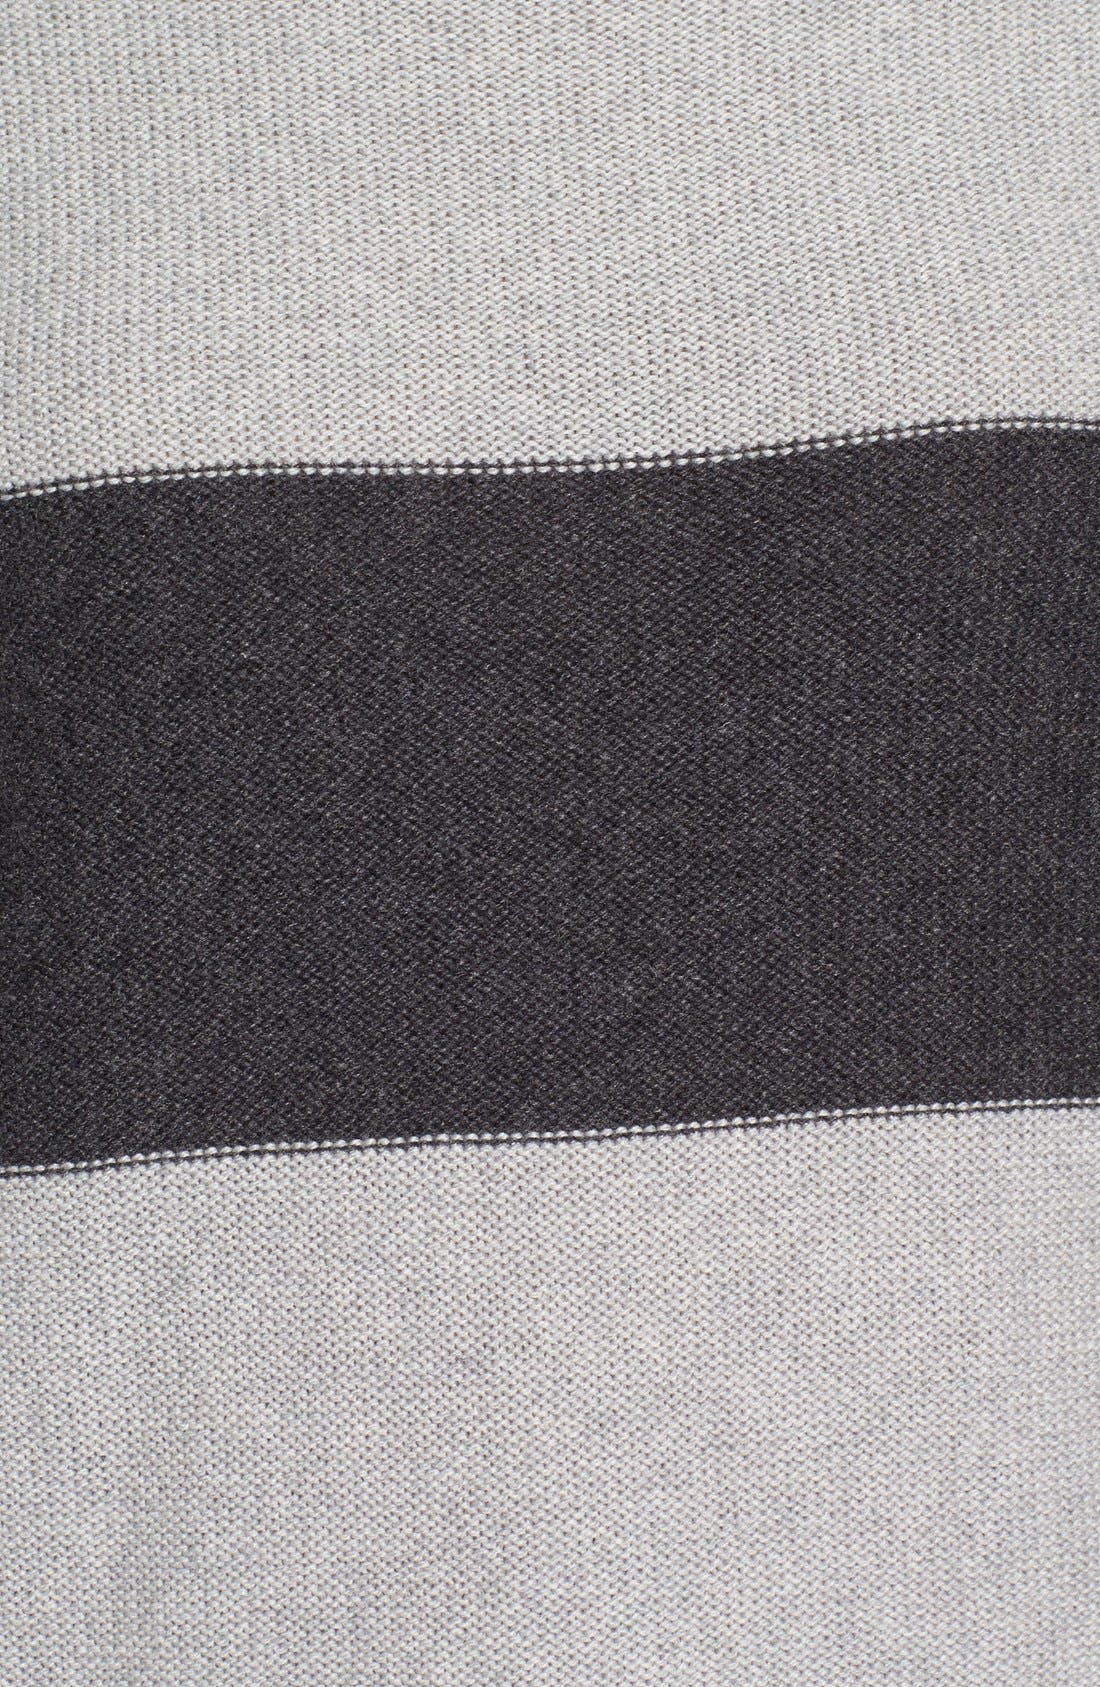 Contrast Cuff Crewneck Sweater,                             Alternate thumbnail 48, color,